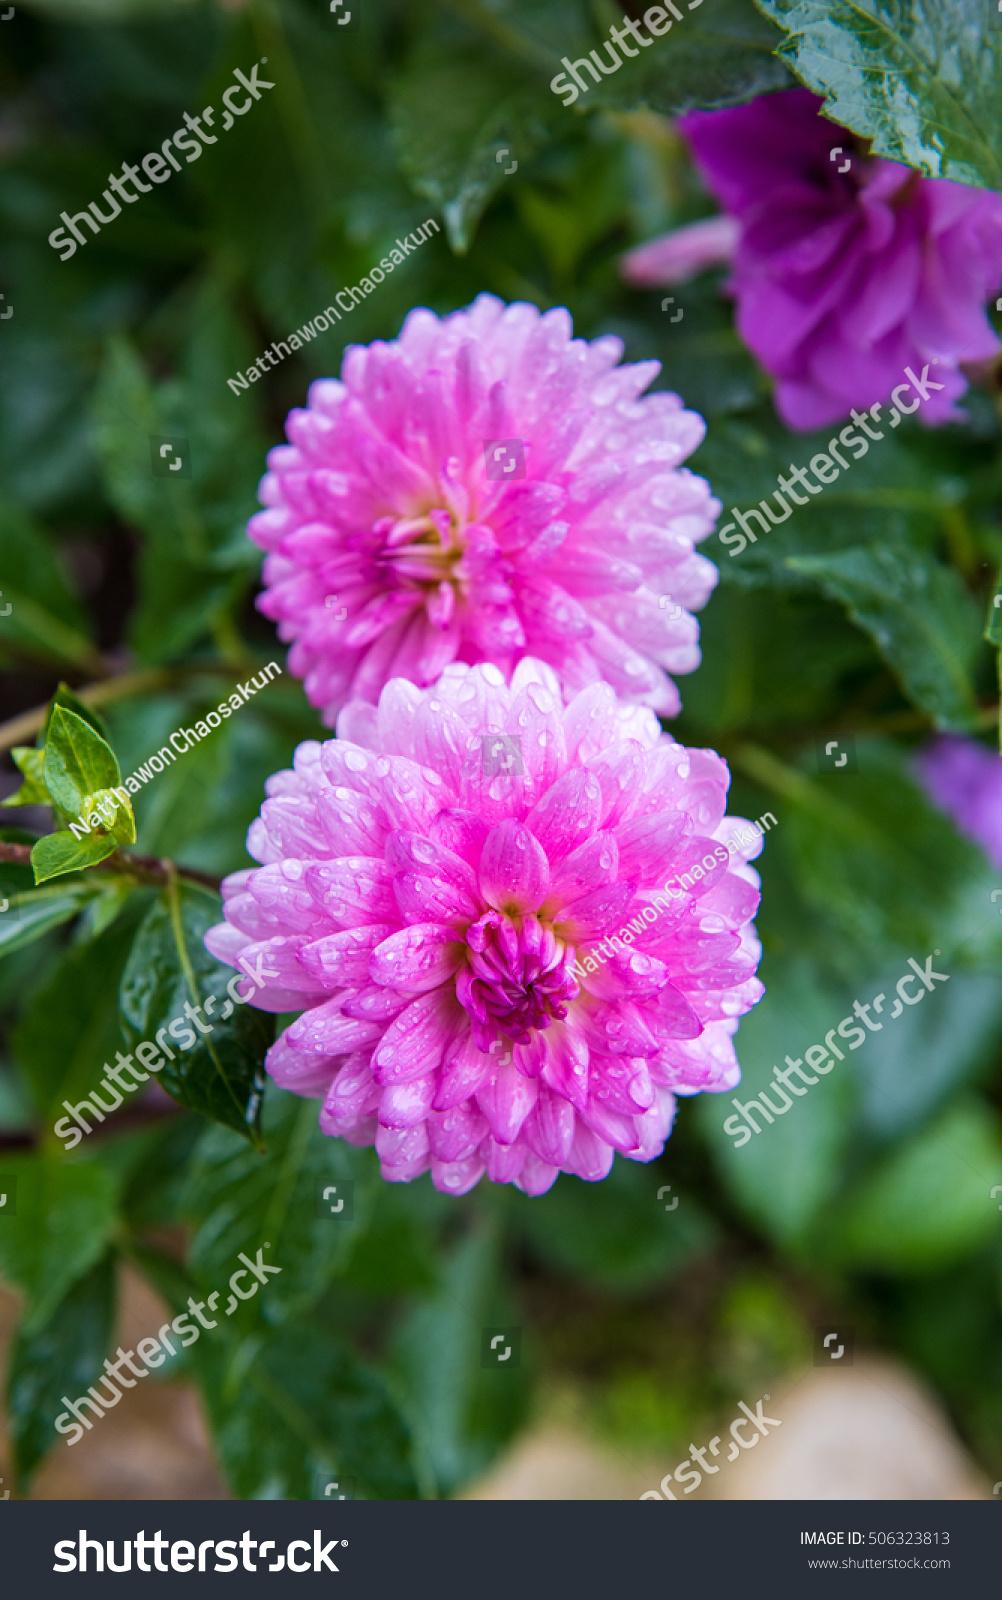 Beautiful colorful winter flowers ez canvas id 506323813 izmirmasajfo